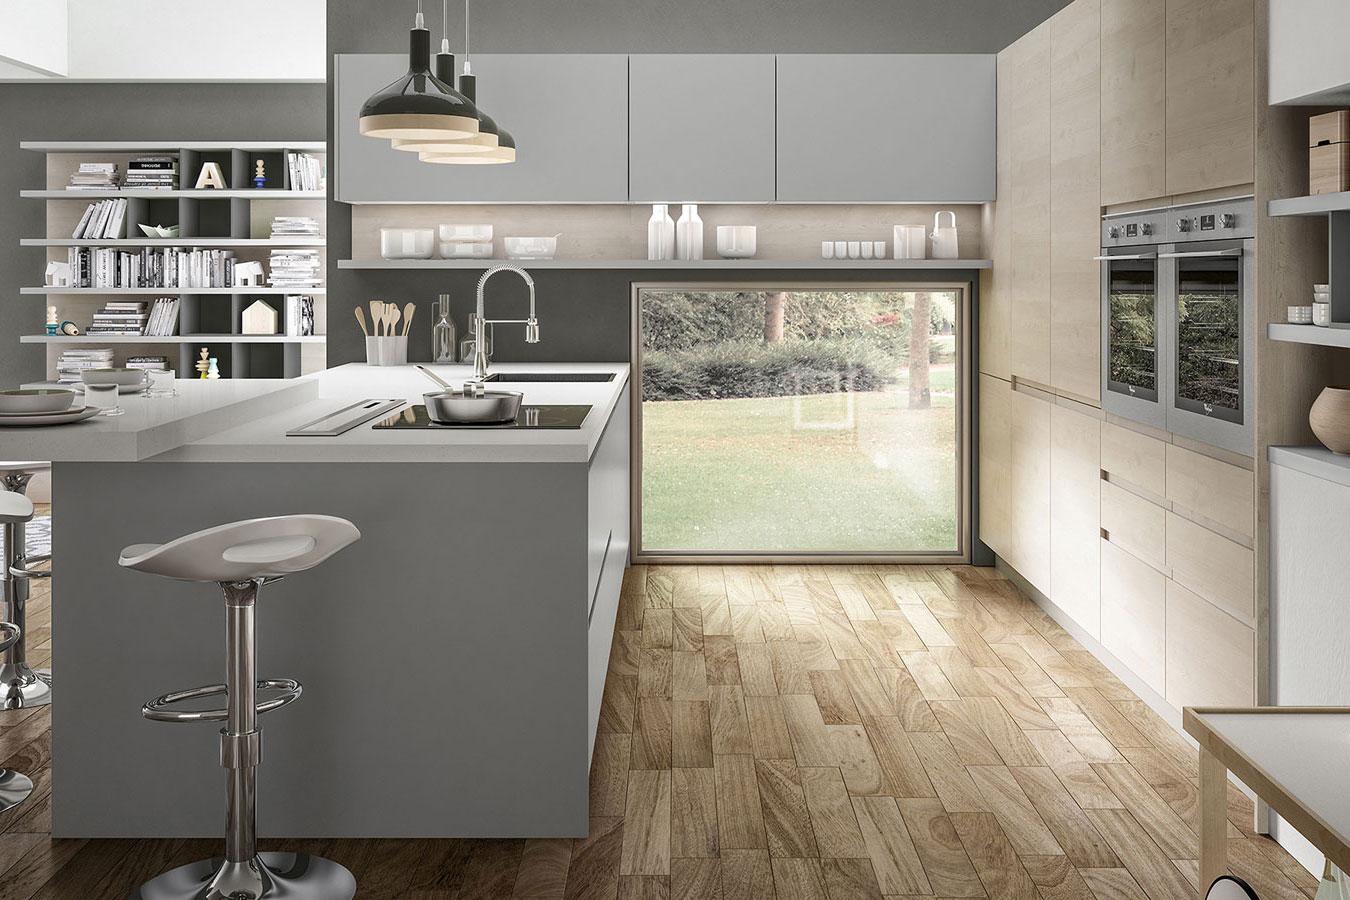 Cucina wega di arredo3 righetti mobili novara for Shop online mobili